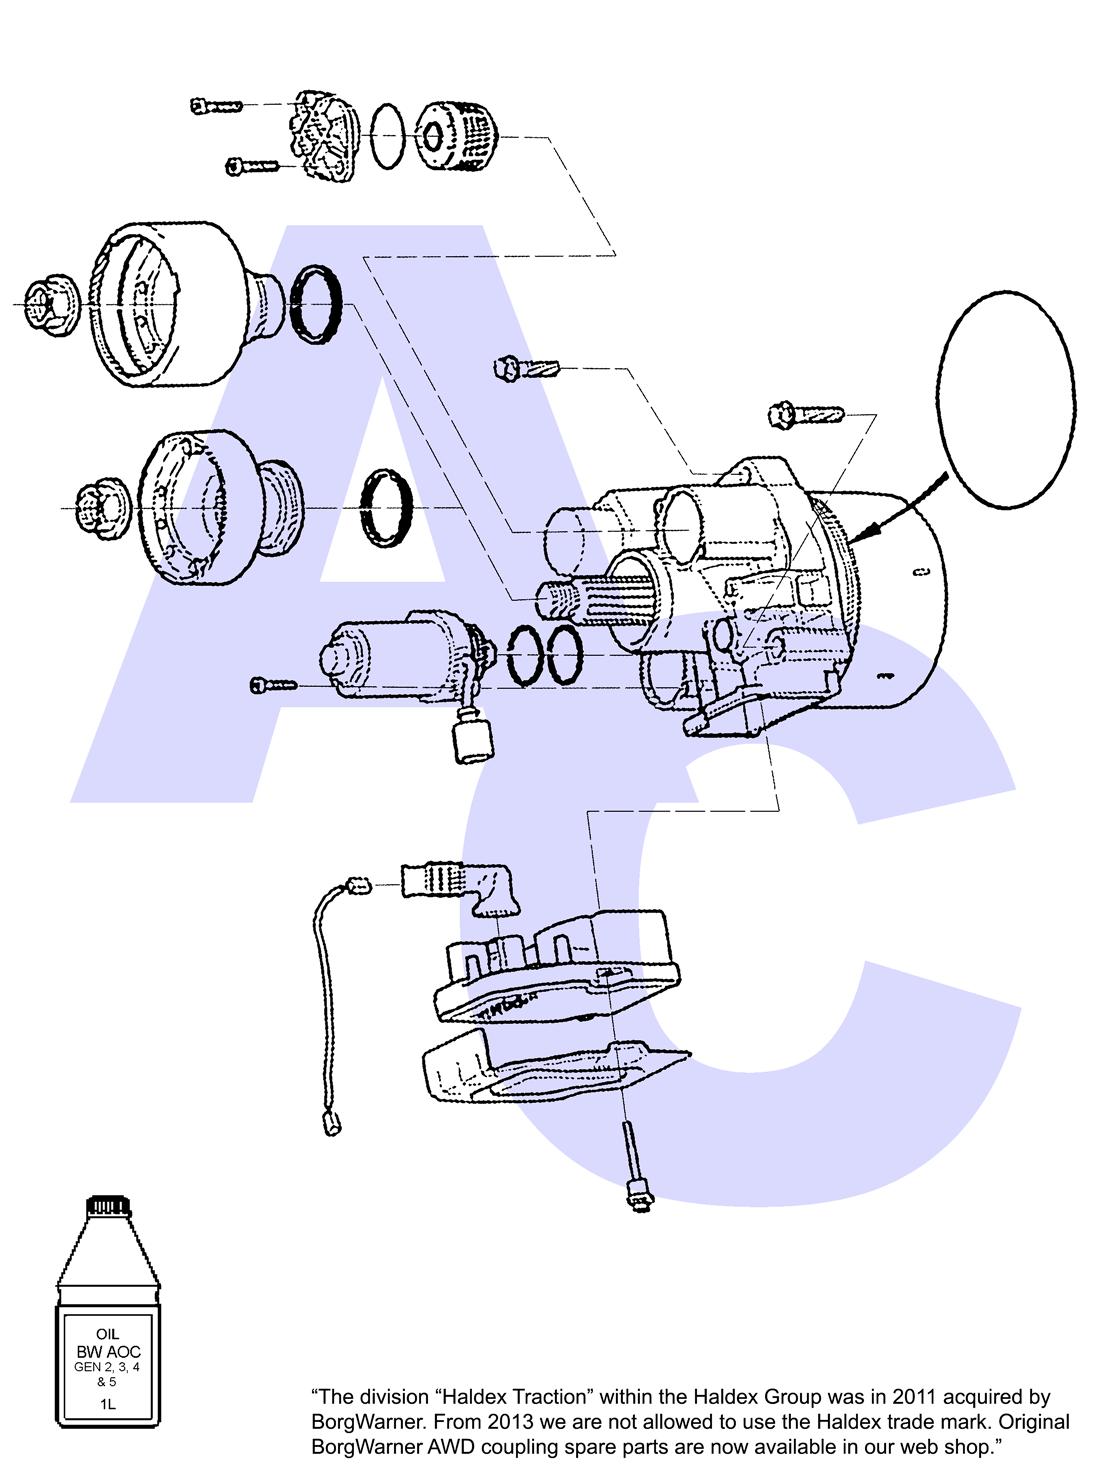 Borg Warner Generation 4, Active On demand Coupling (AOC) Parts